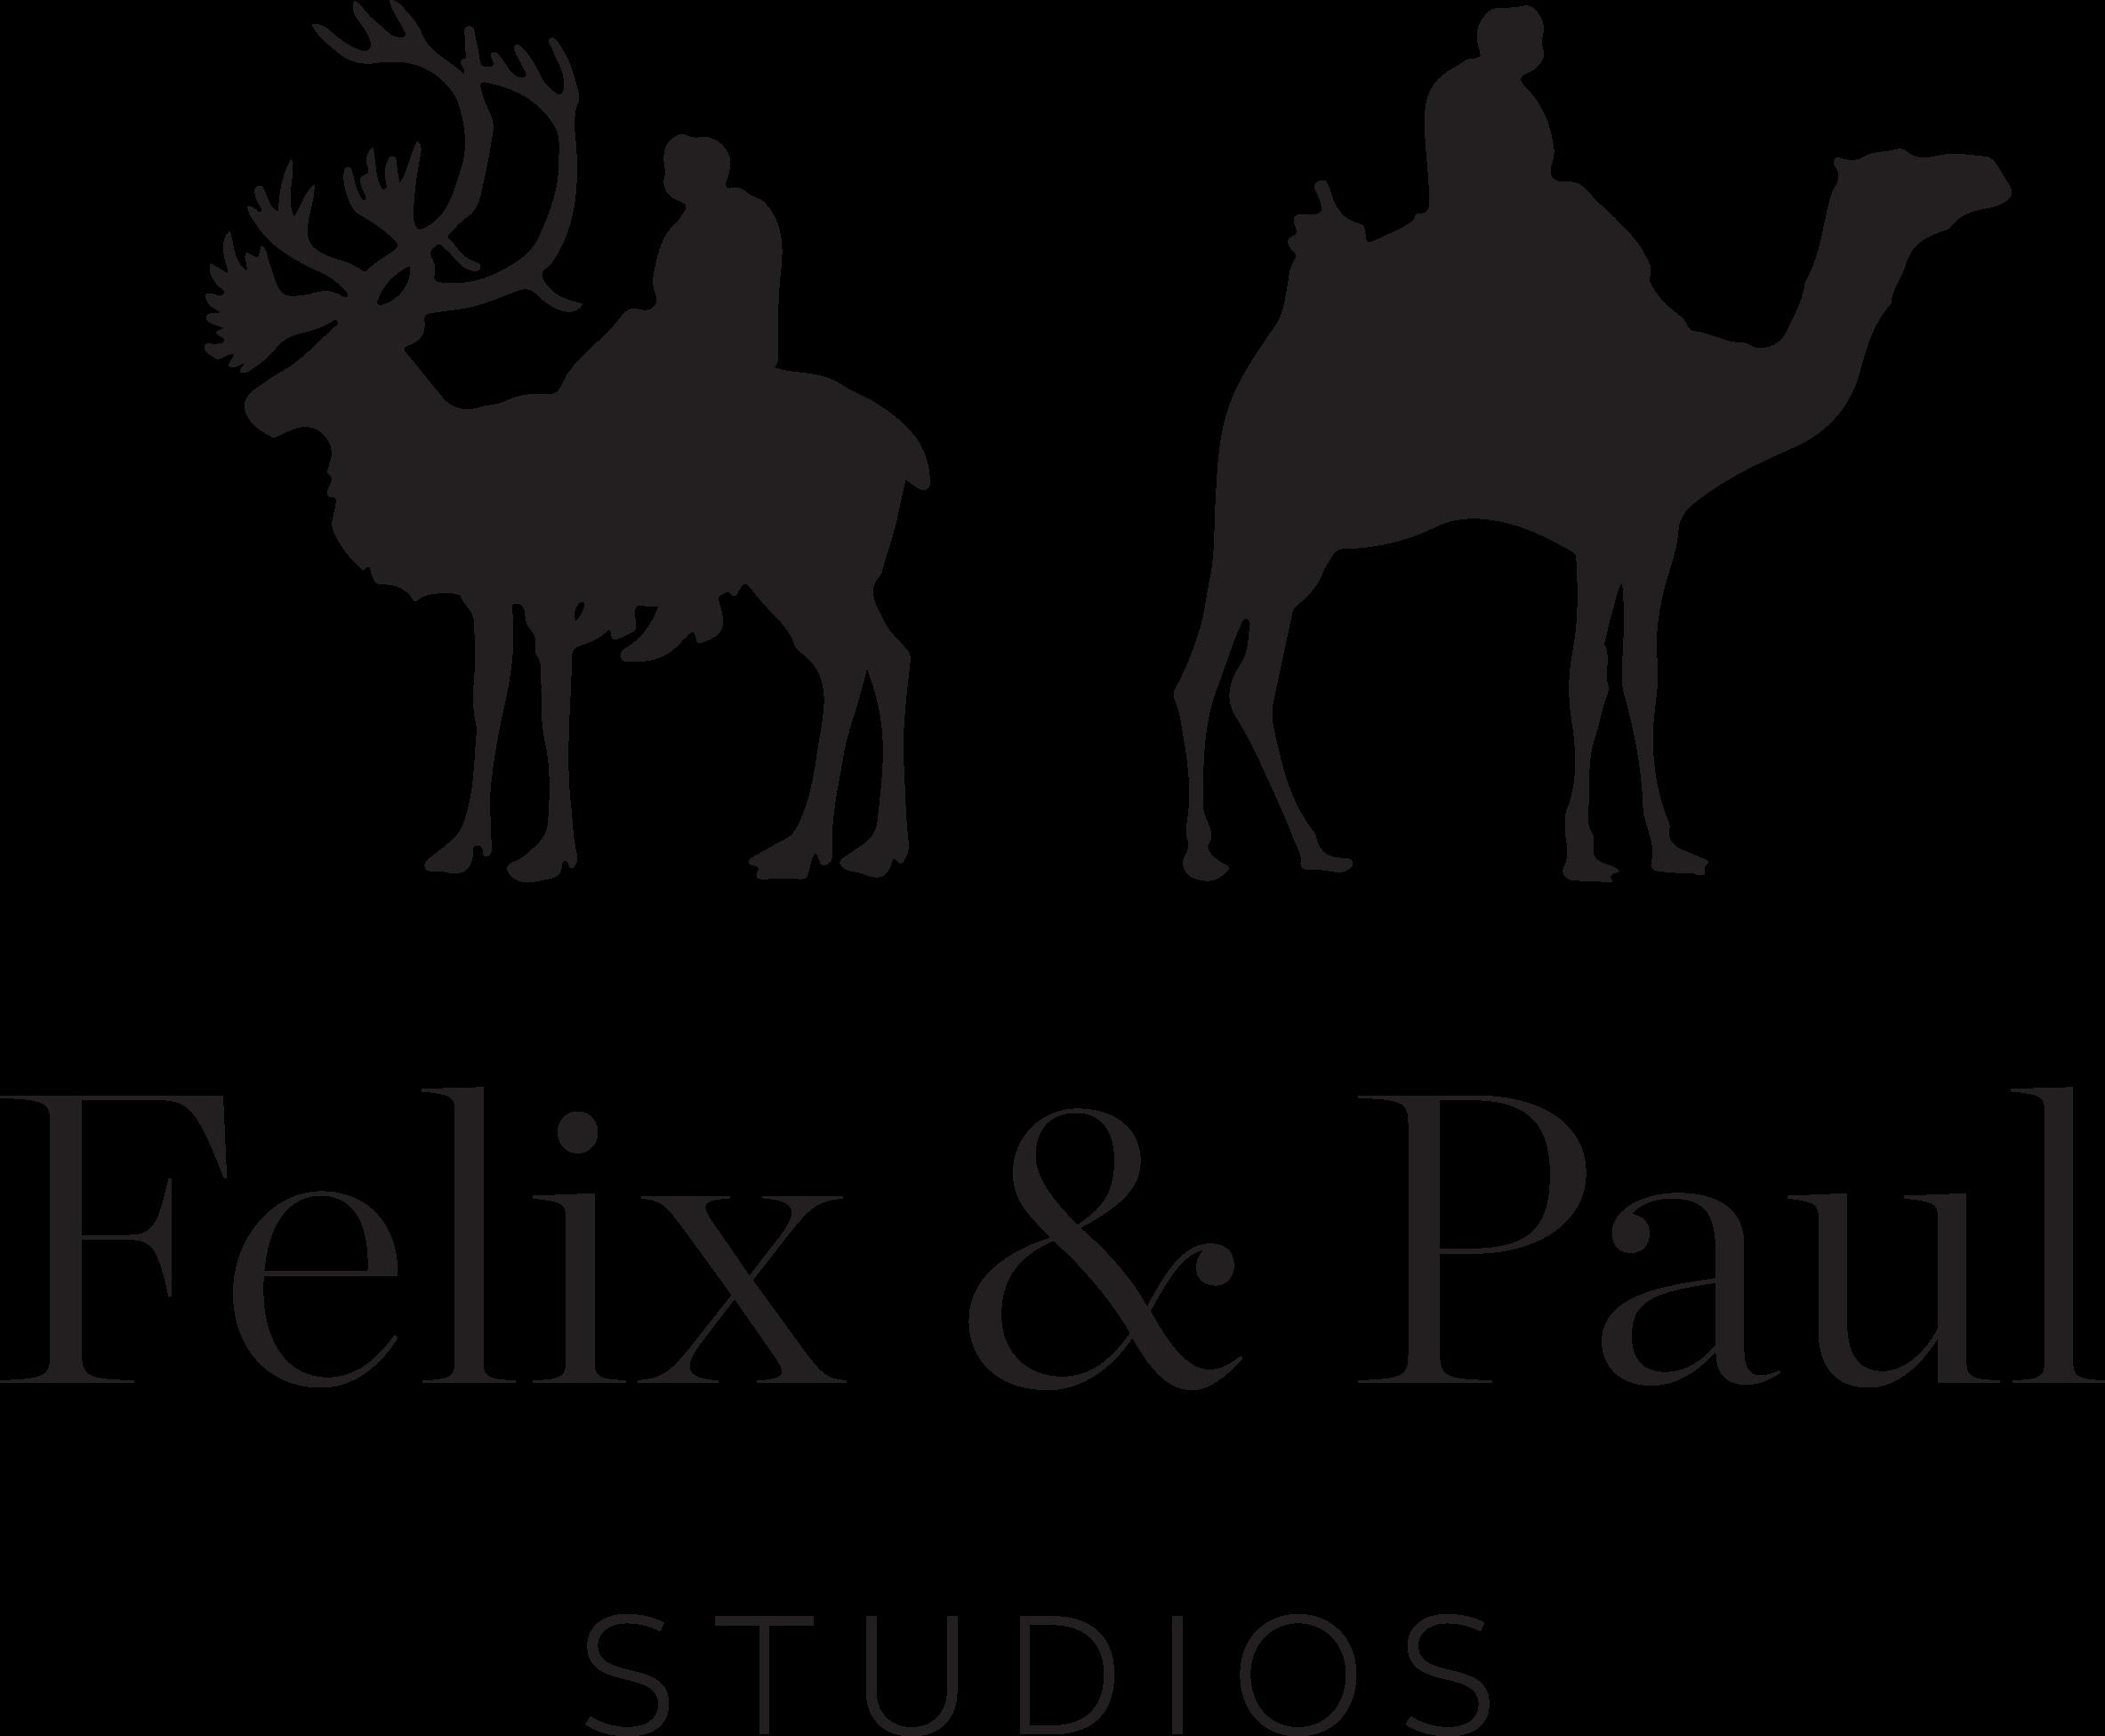 FelixPaul LOGO 2015